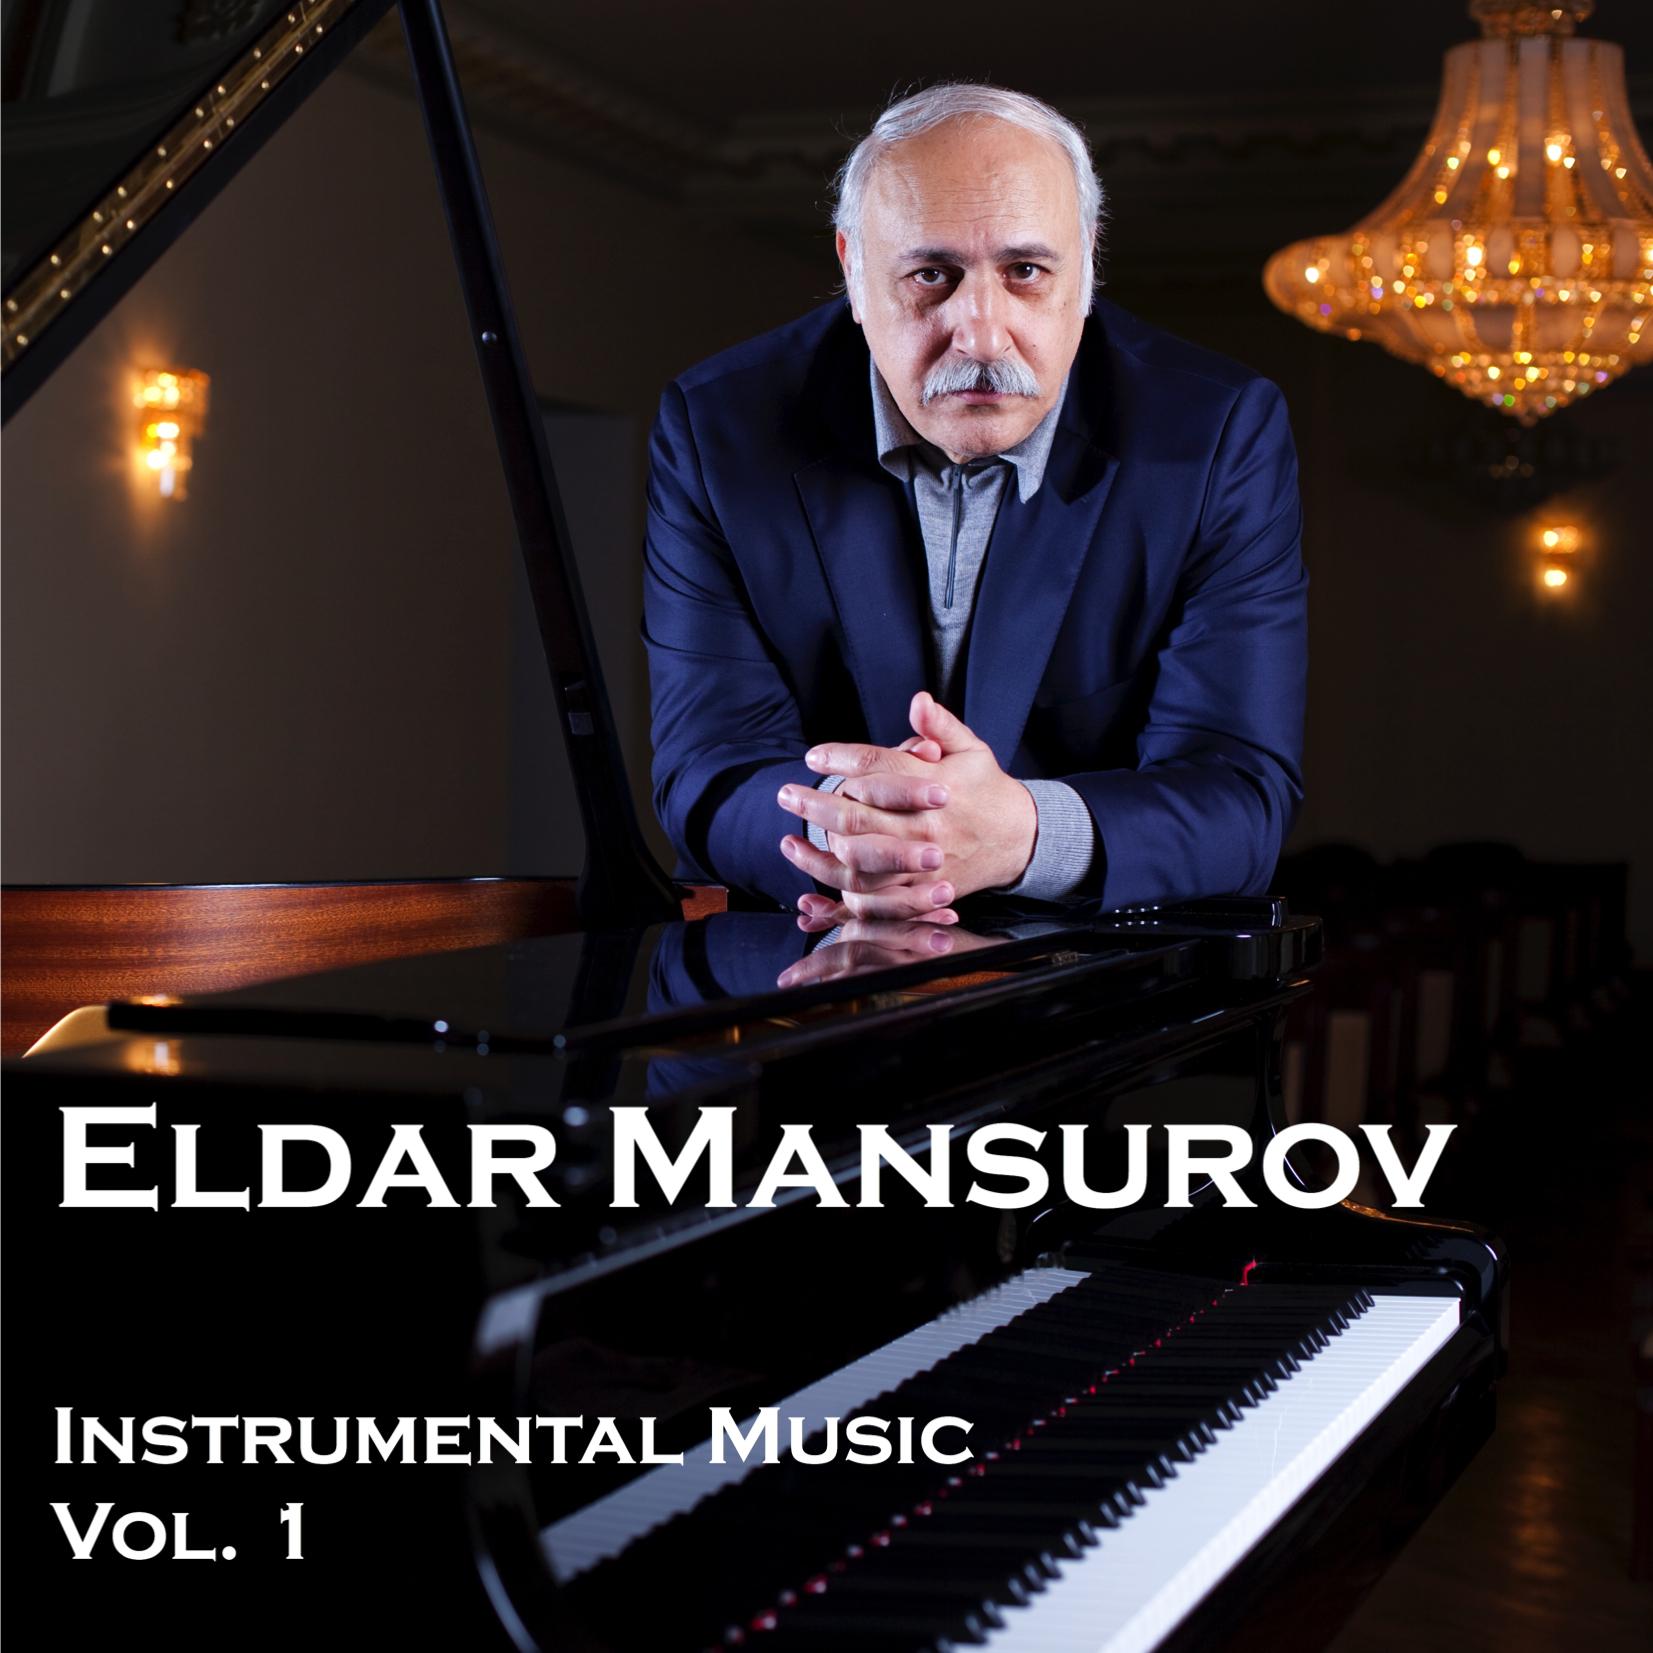 Instrumental Music Vol. 1